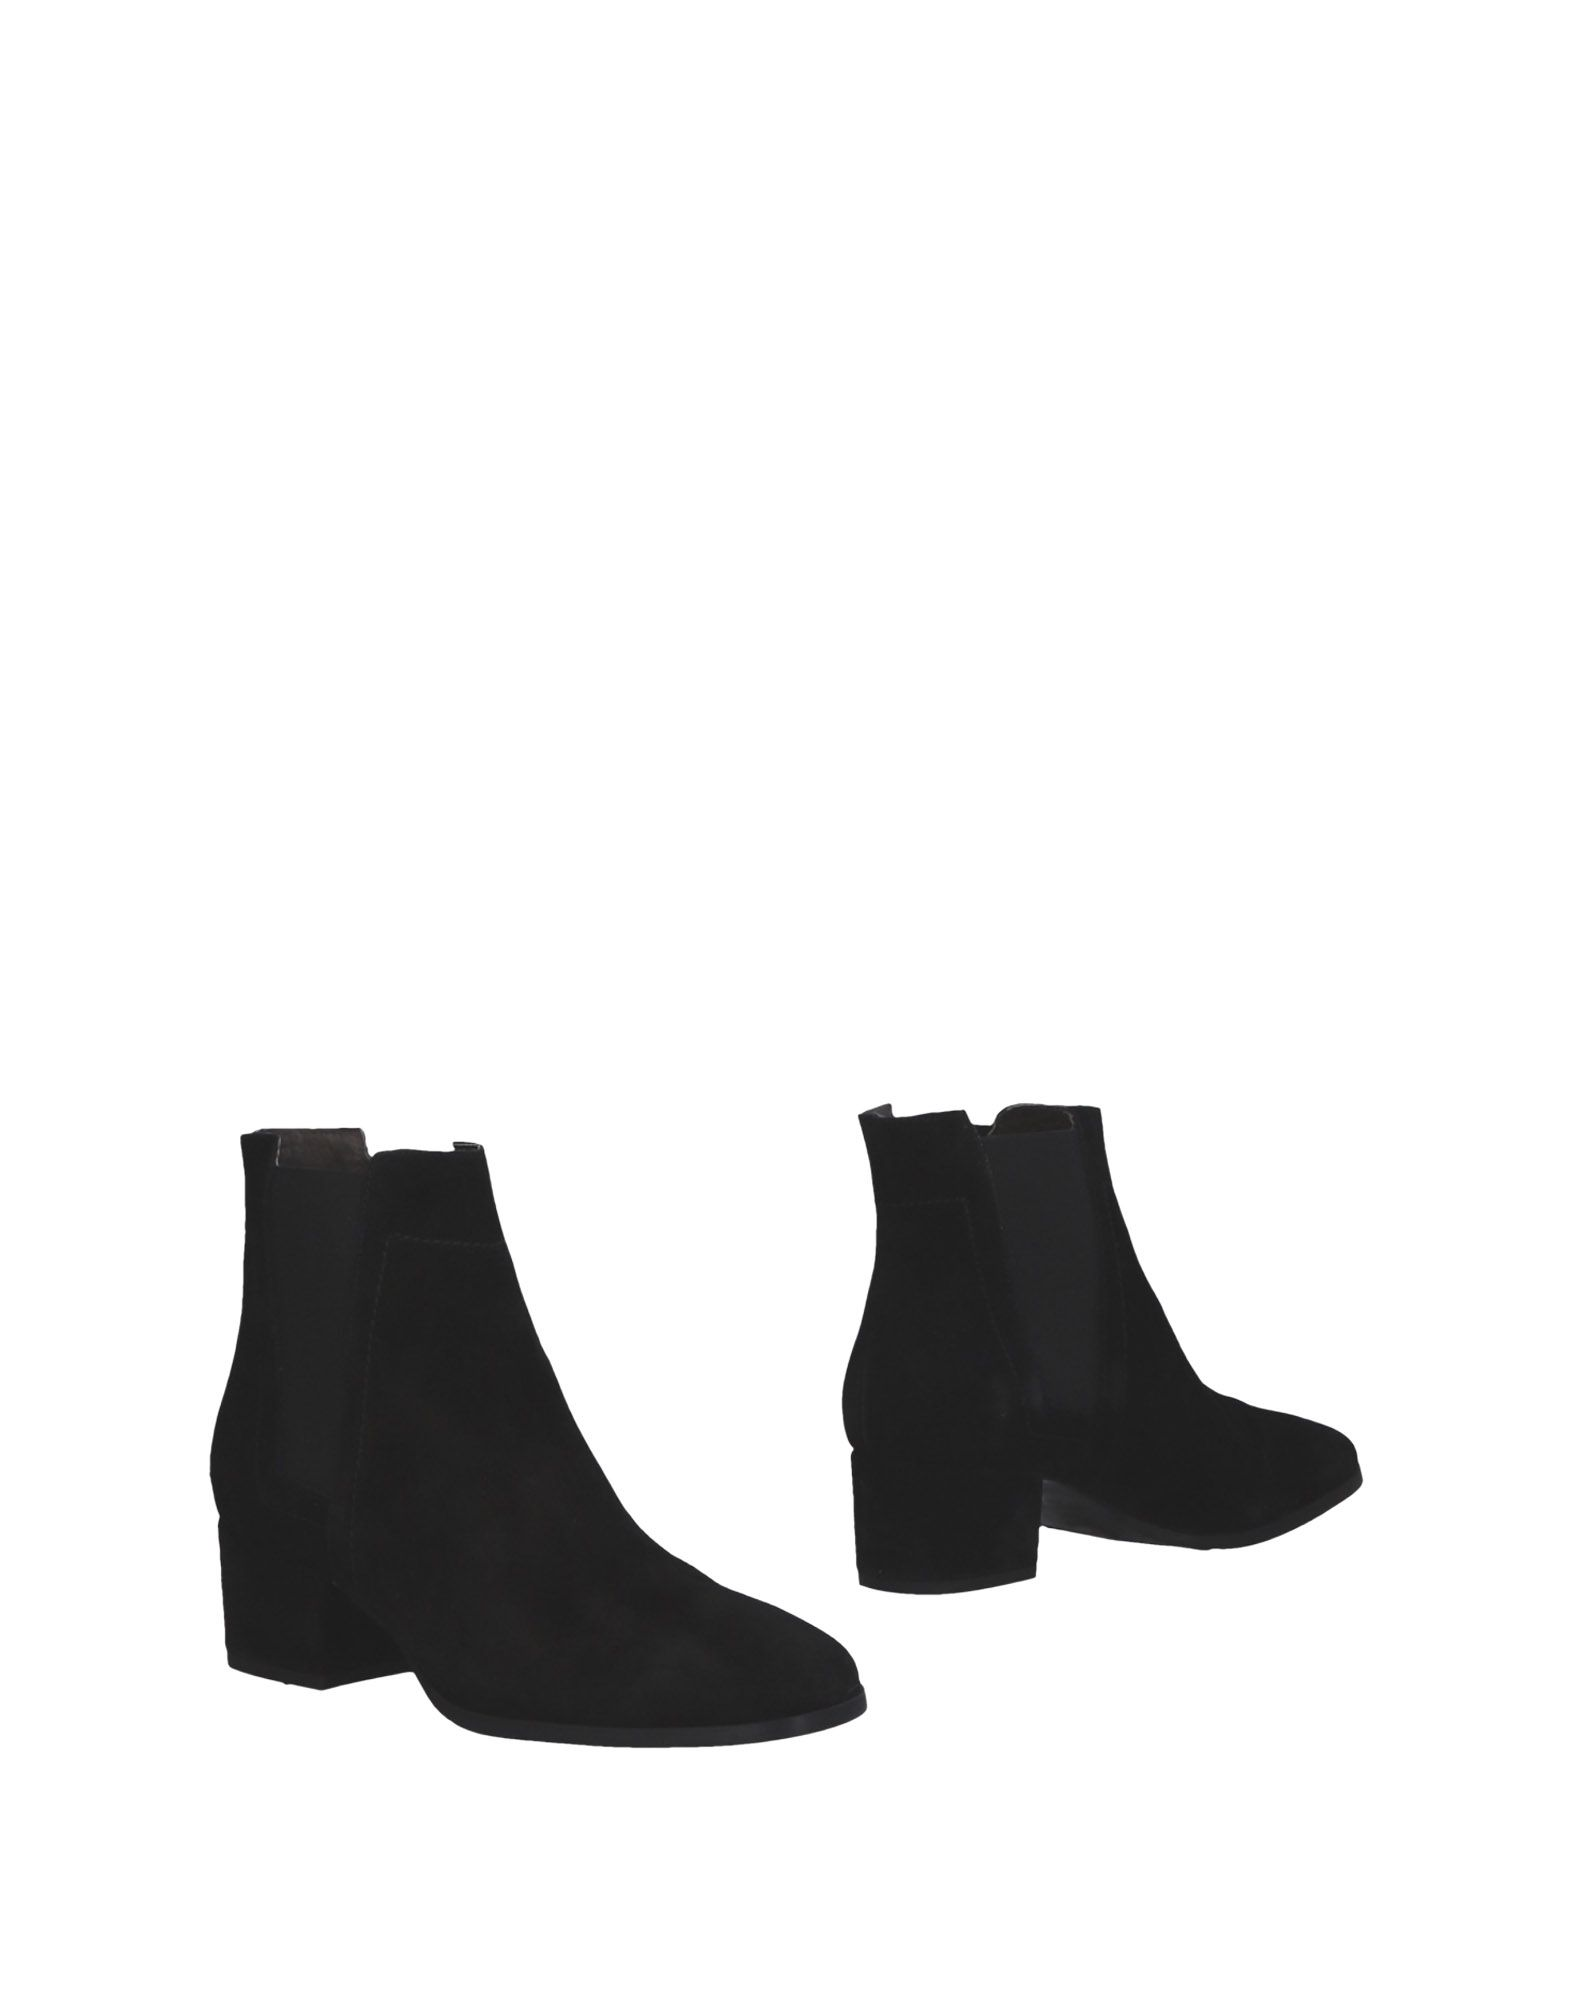 Paola Ferri Ankle Ferri Boot - Women Paola Ferri Ankle Ankle Boots online on  Australia - 11475960WU f8acfb